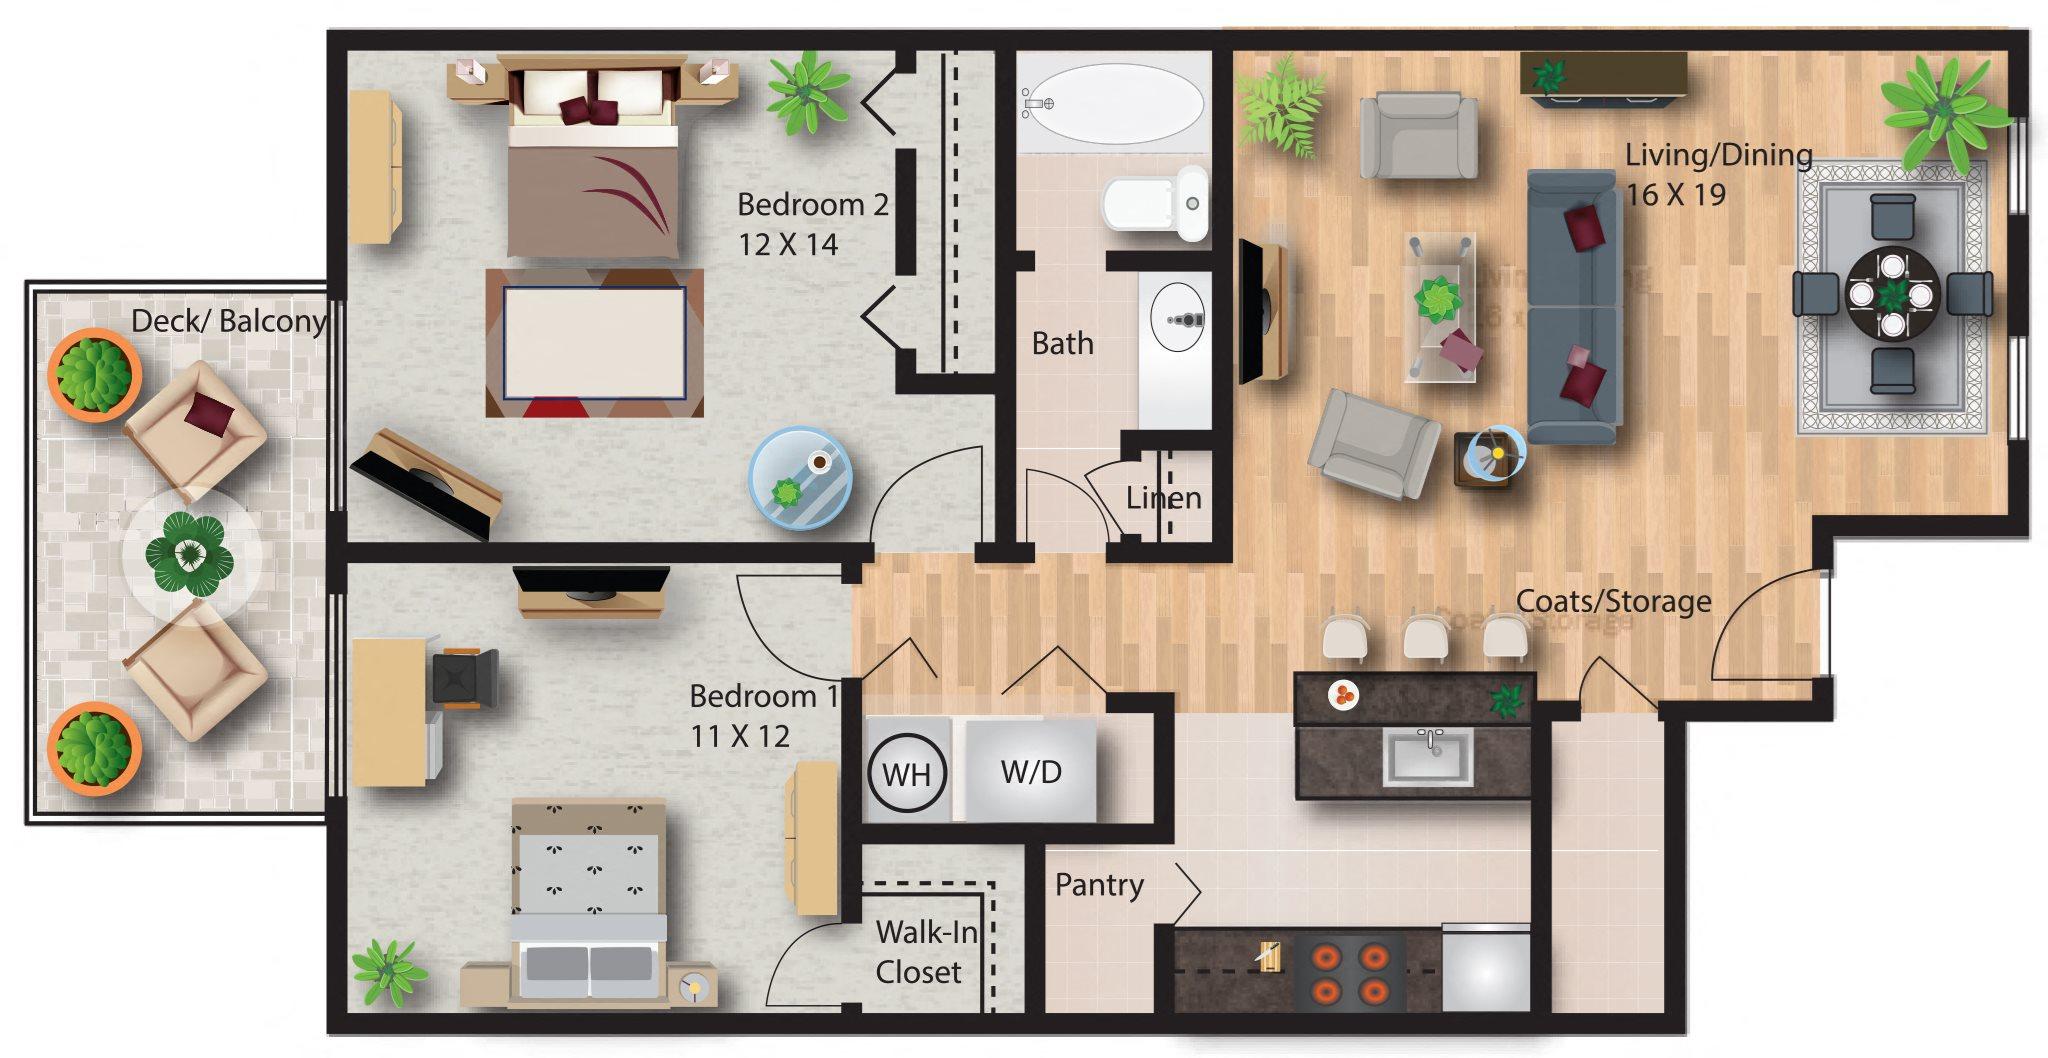 Hickory Floor Plan 5